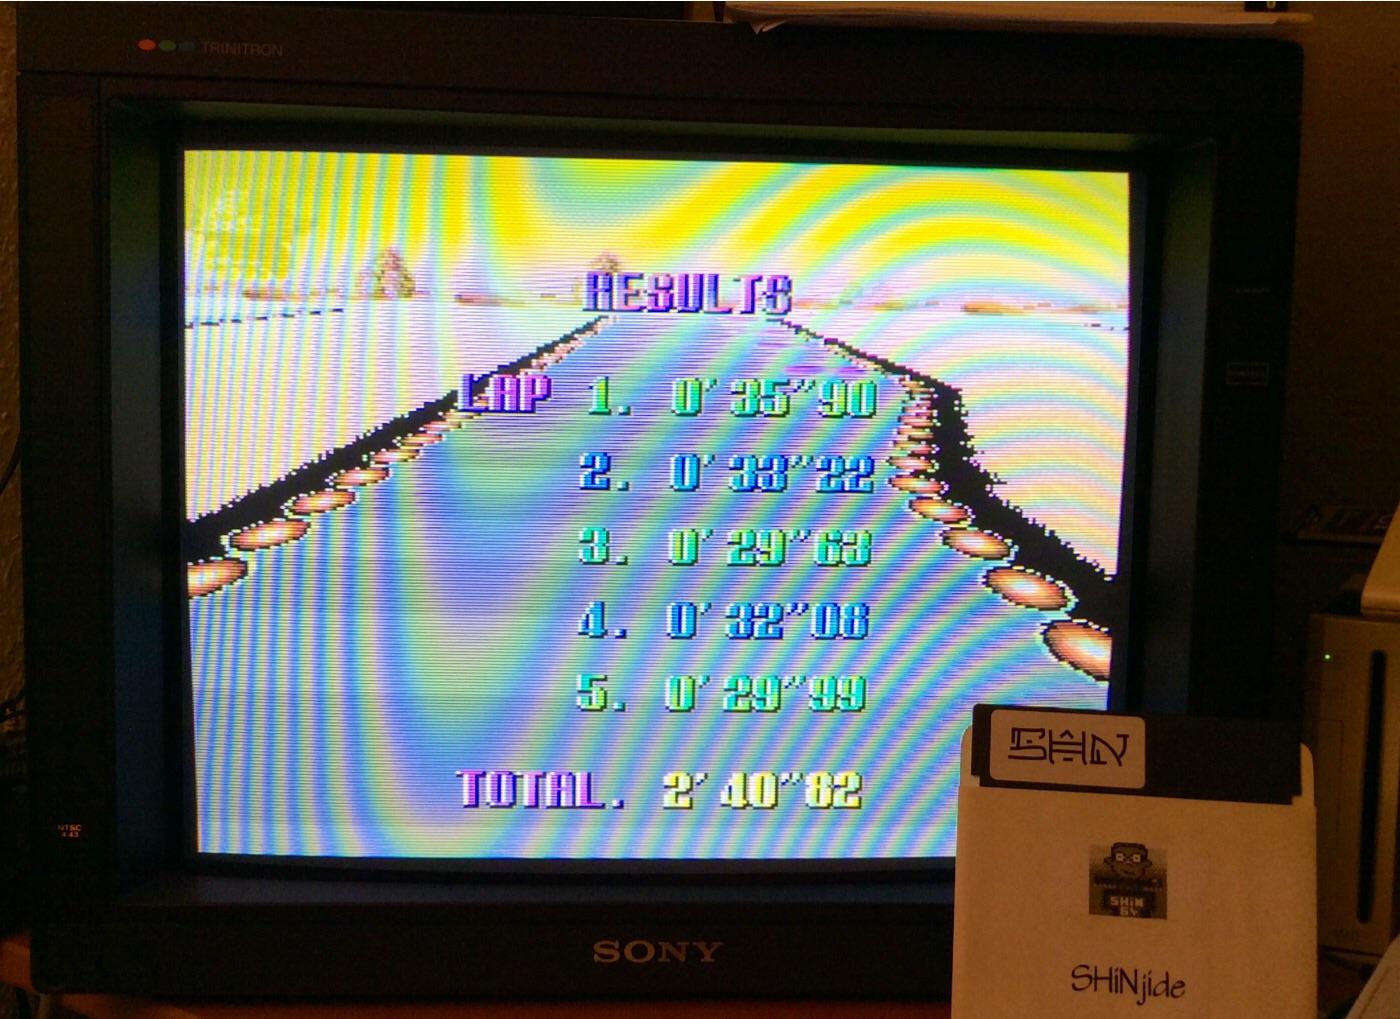 SHiNjide: F-Zero: Sand Ocean [Beginner] (SNES/Super Famicom Emulated) 0:02:40.82 points on 2014-12-23 11:21:46